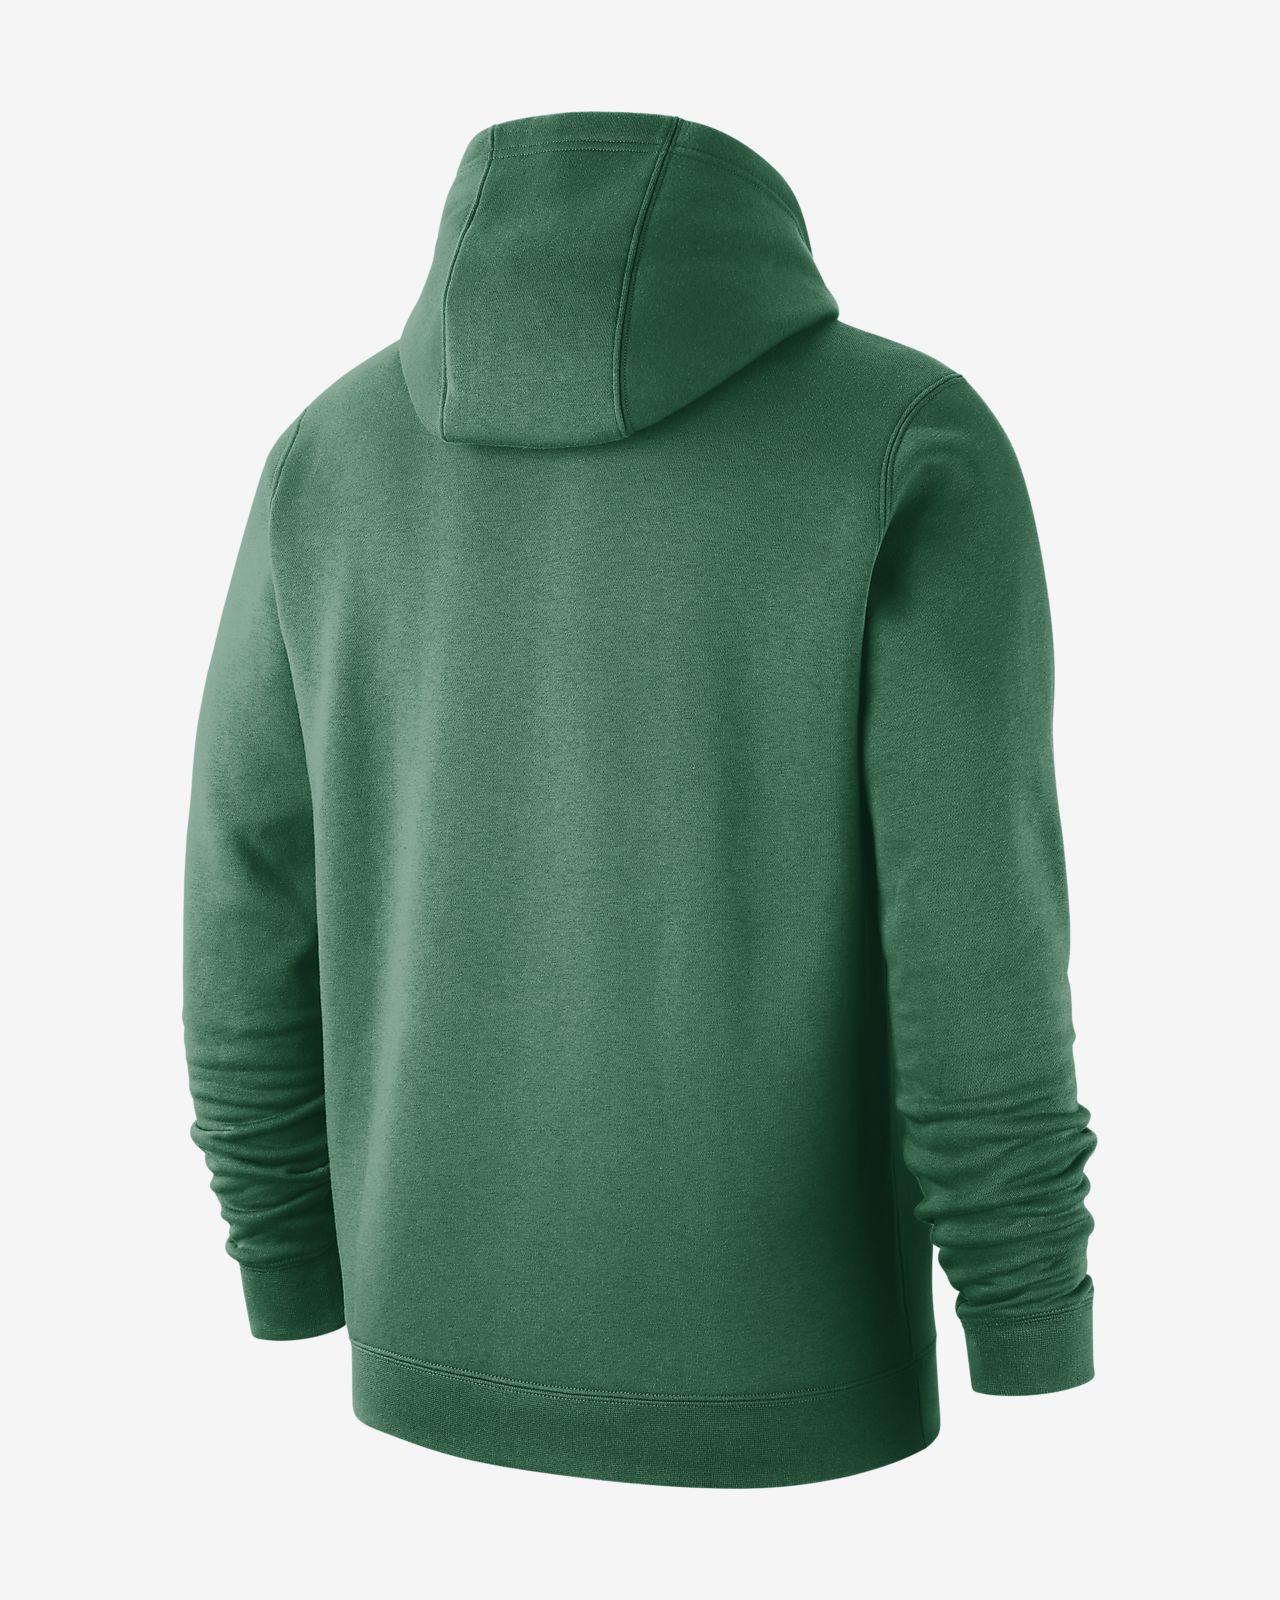 outlet store ea96f b22b5 Boston Celtics Nike Men's NBA Hoodie